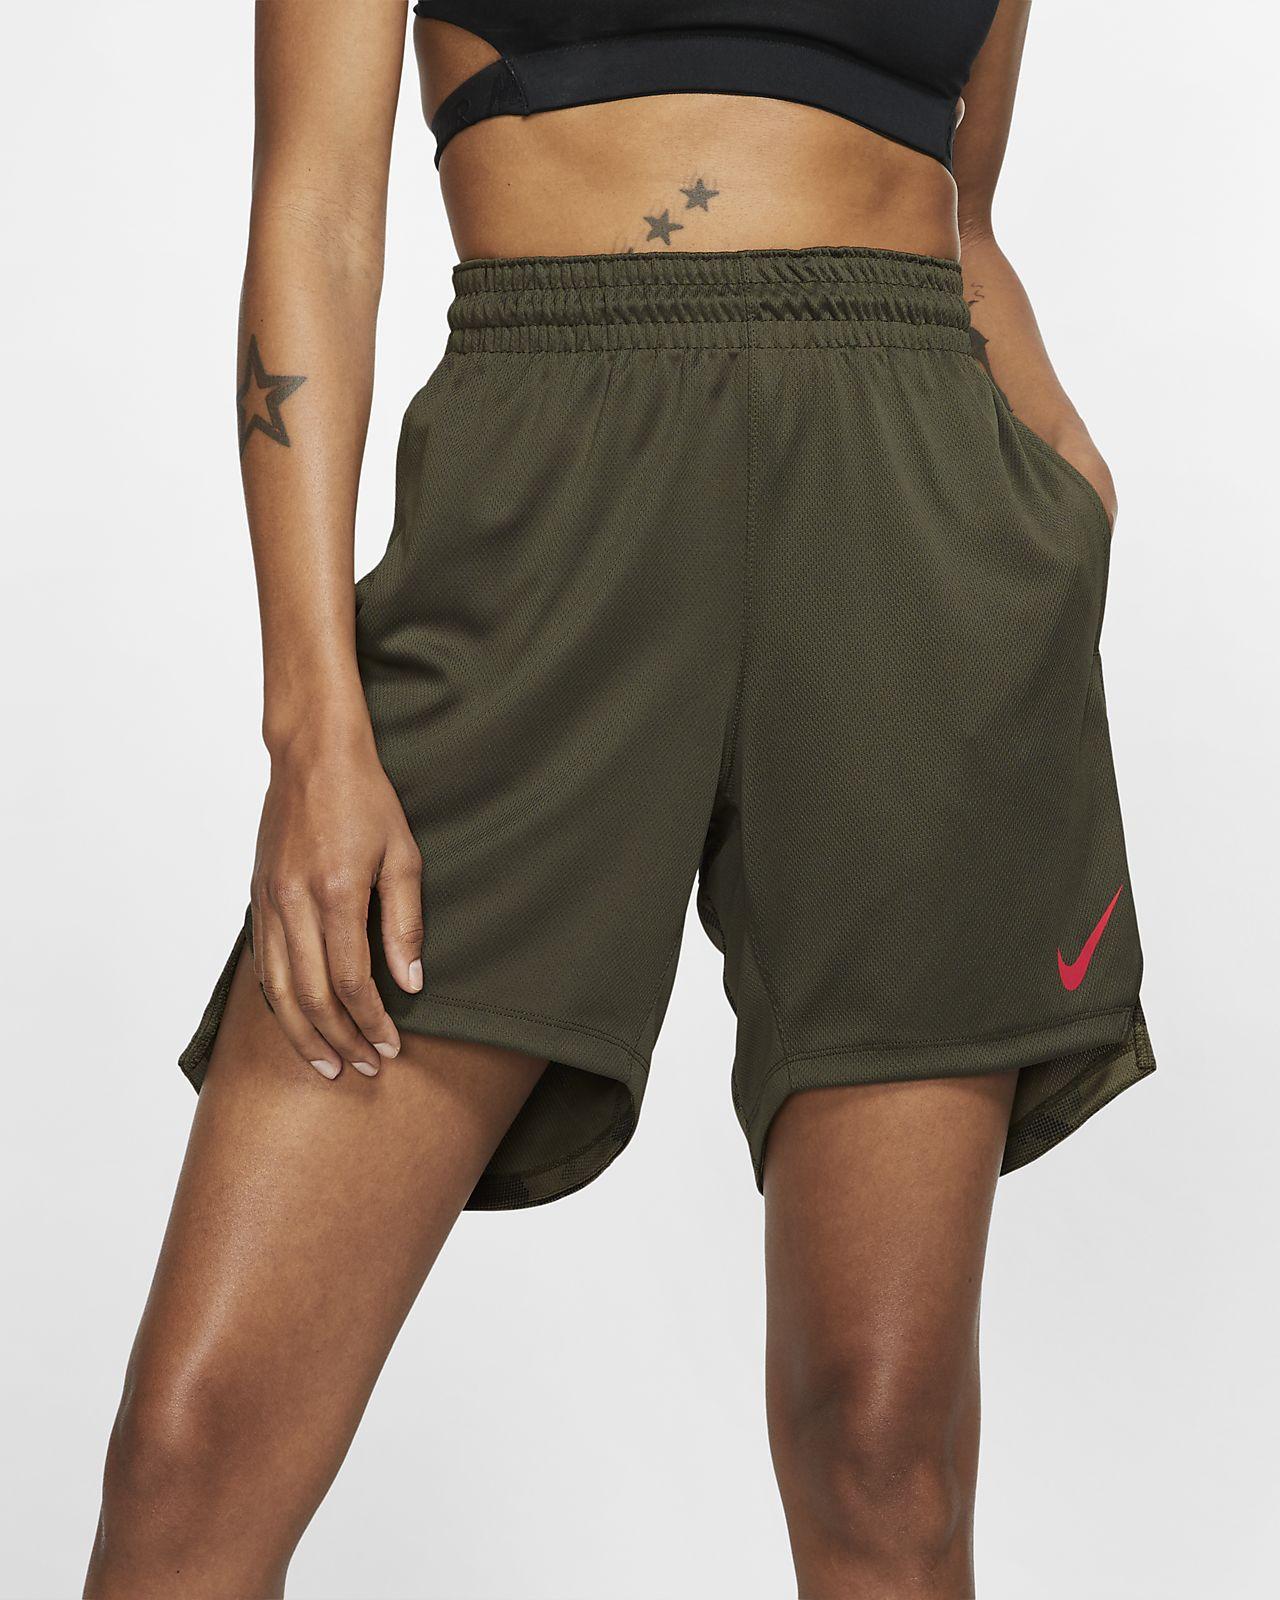 Shorts de básquetbol tejidos para mujer Nike Elite